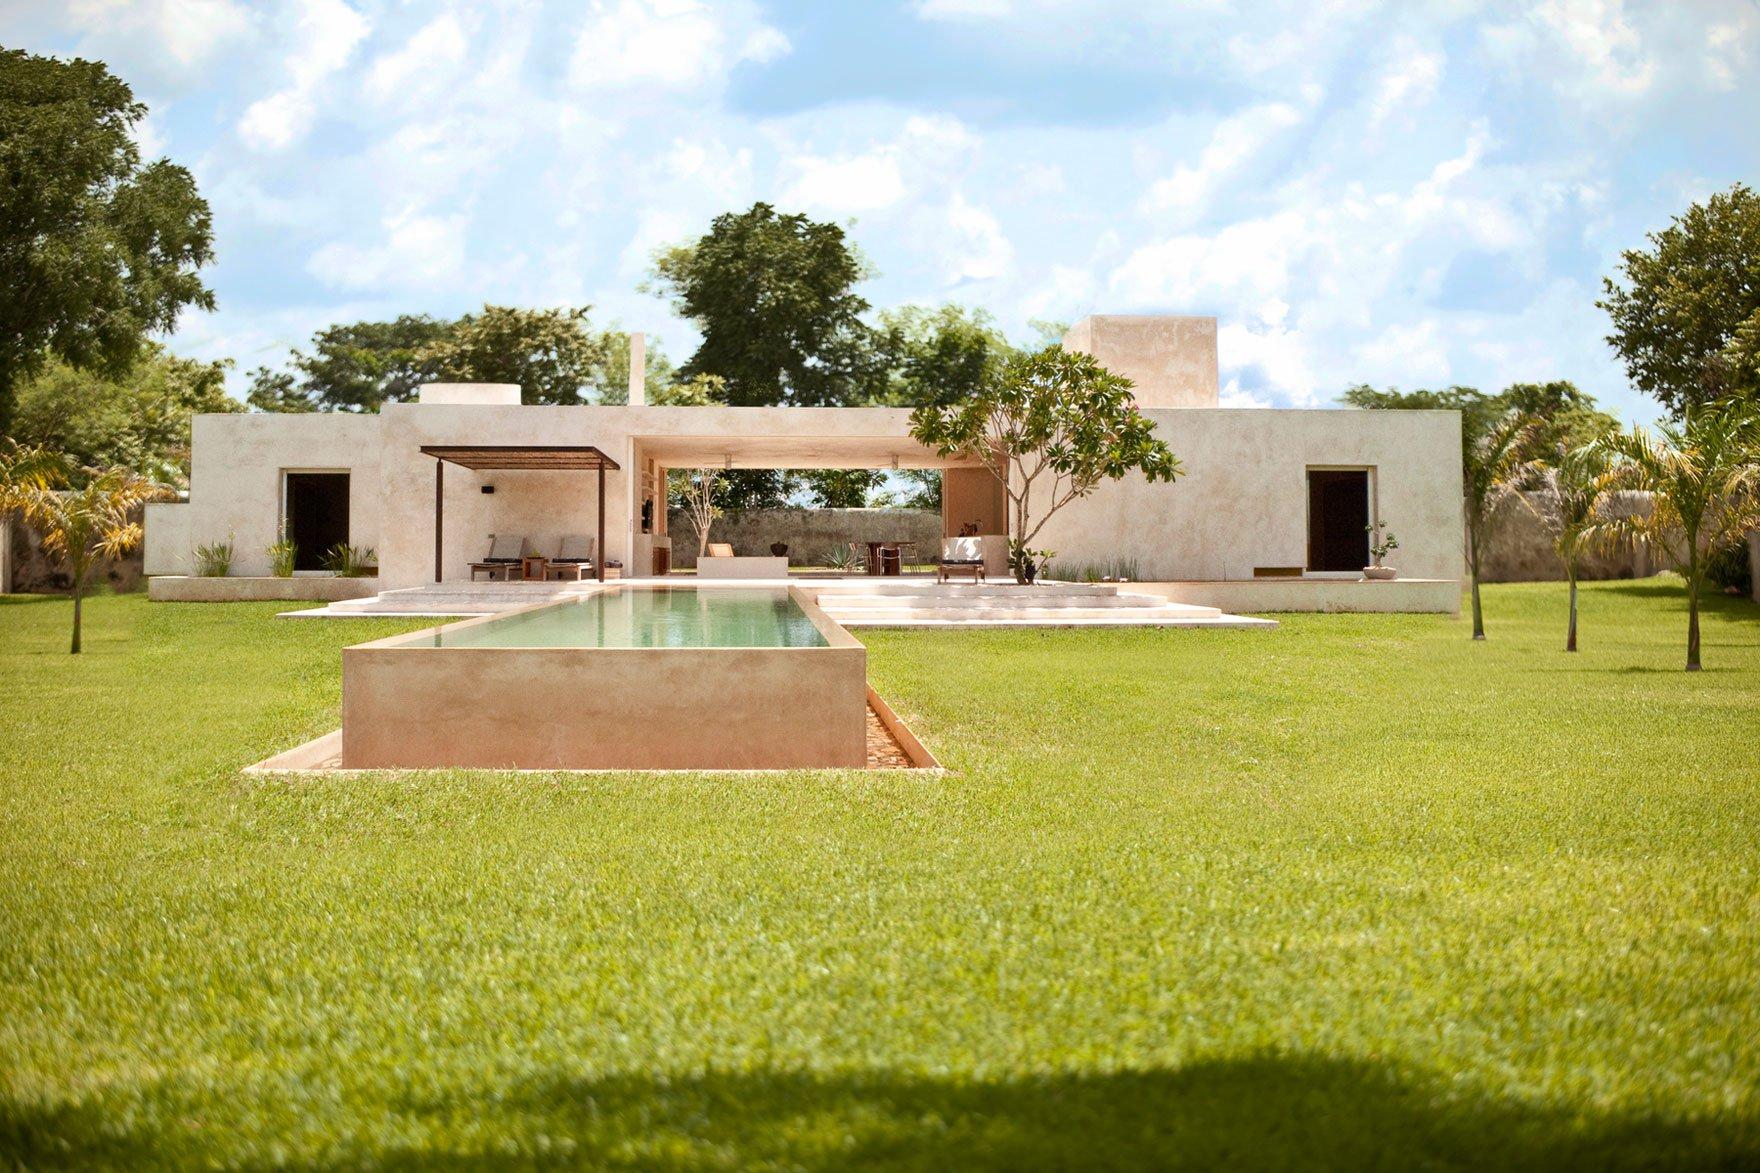 Hacienda sac chich by reyes r os larra n arquitectos for Home architecture blog